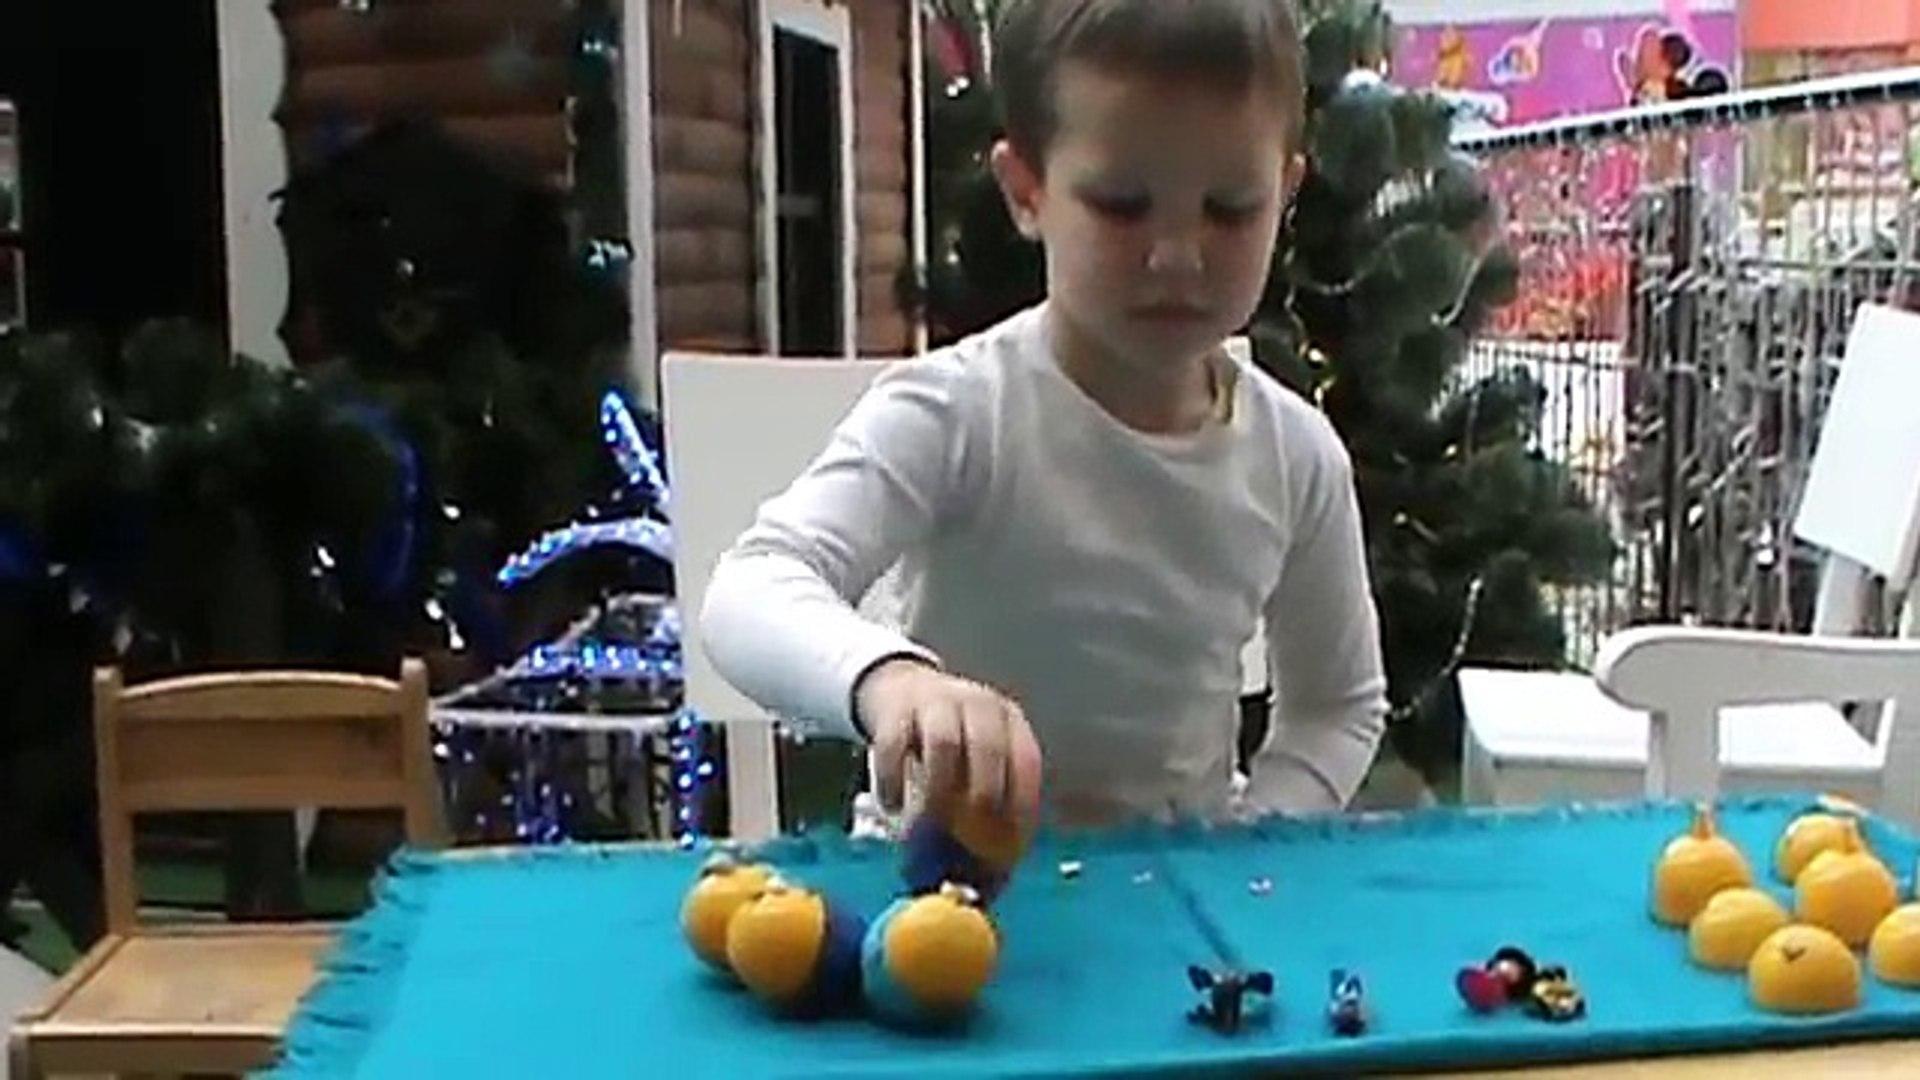 Миньоны яйца с сюрпризом открываем игрушки Minions oeufs avec des jouets surprise ouvertes